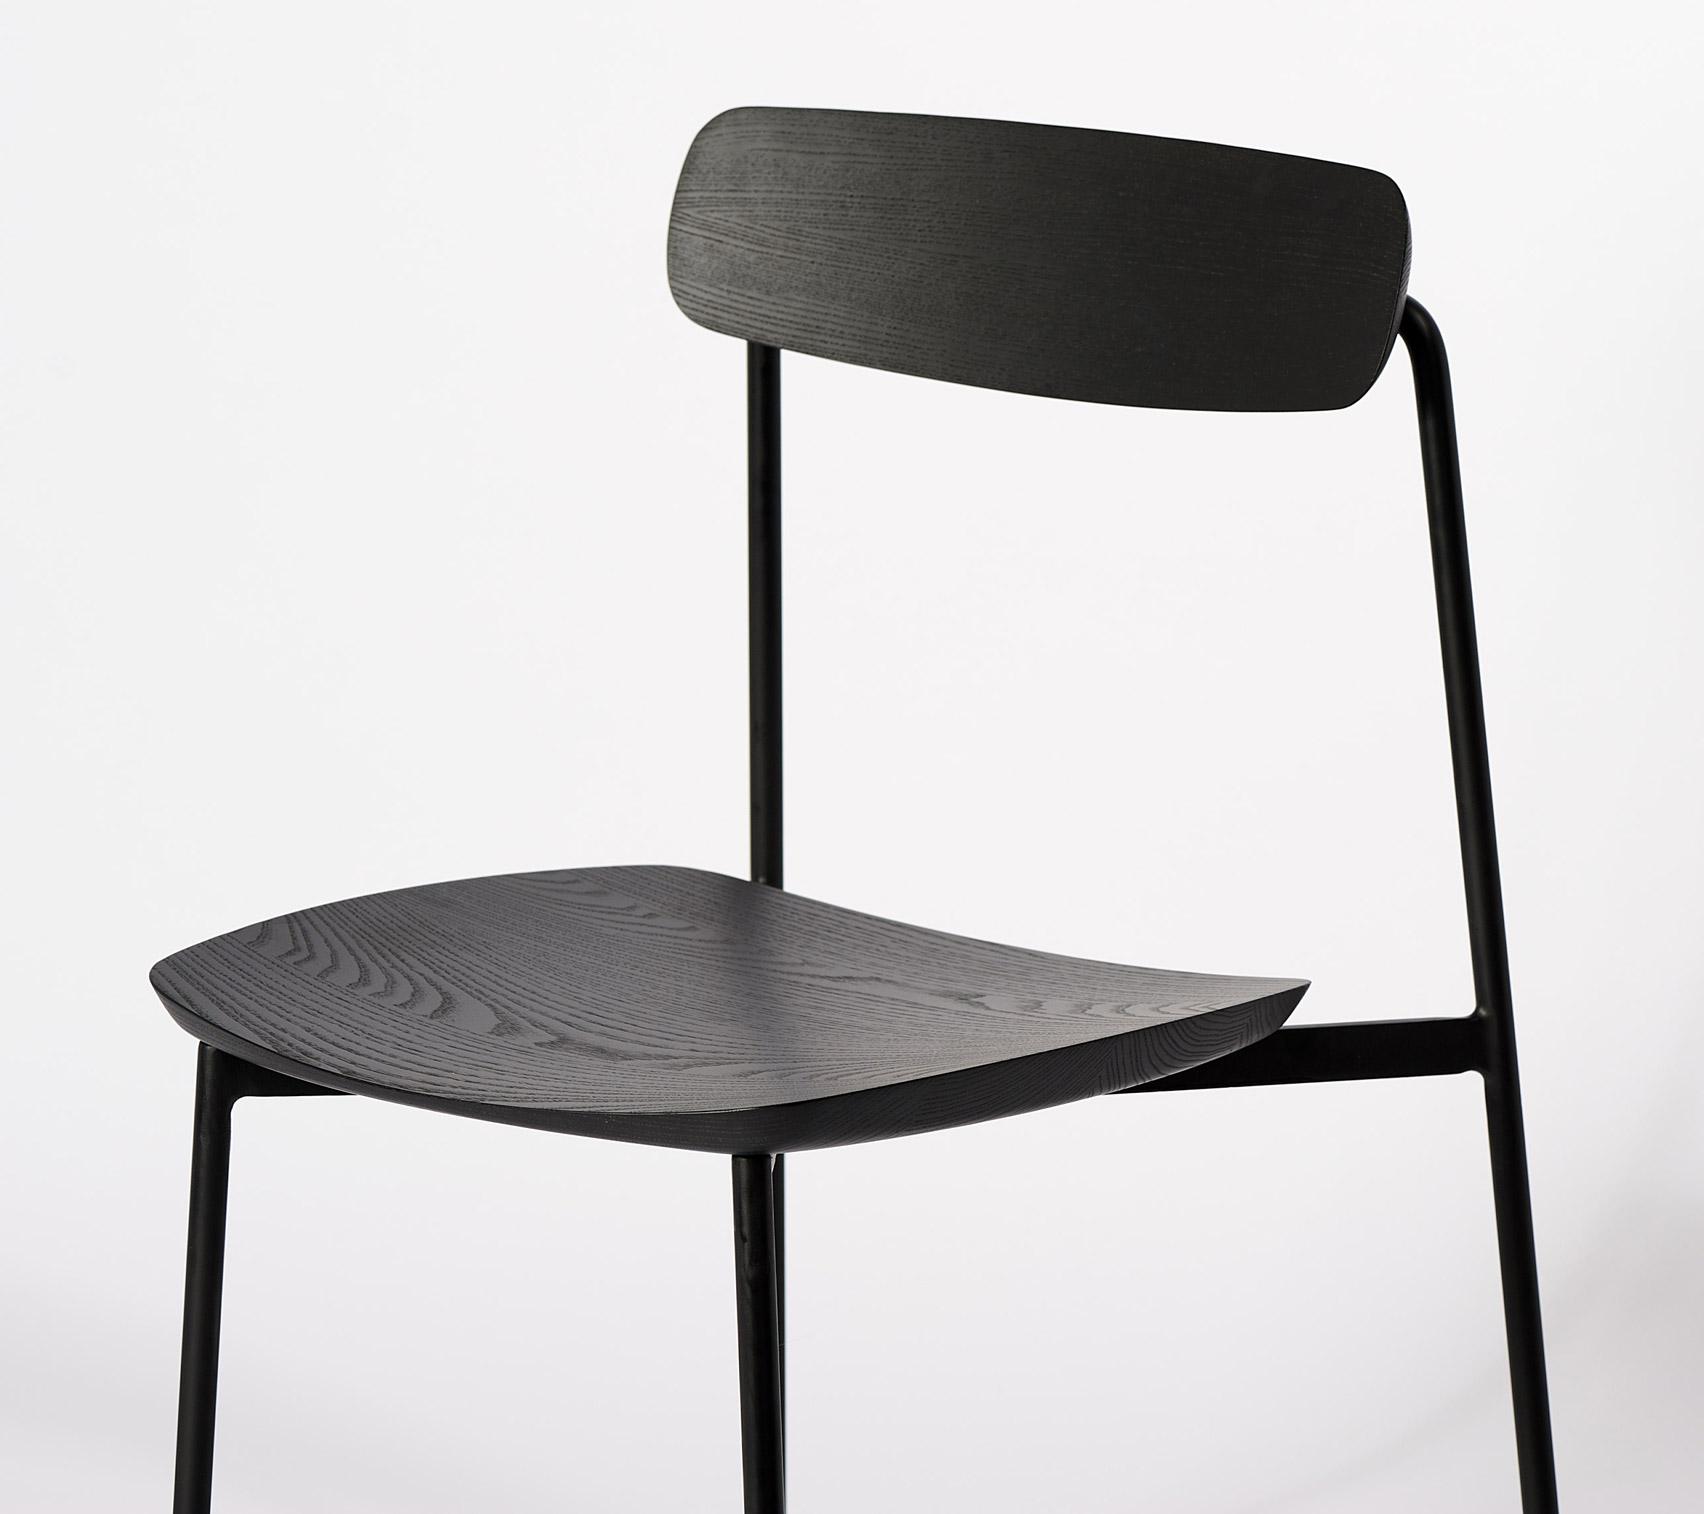 Sia chair by Tom Fereday